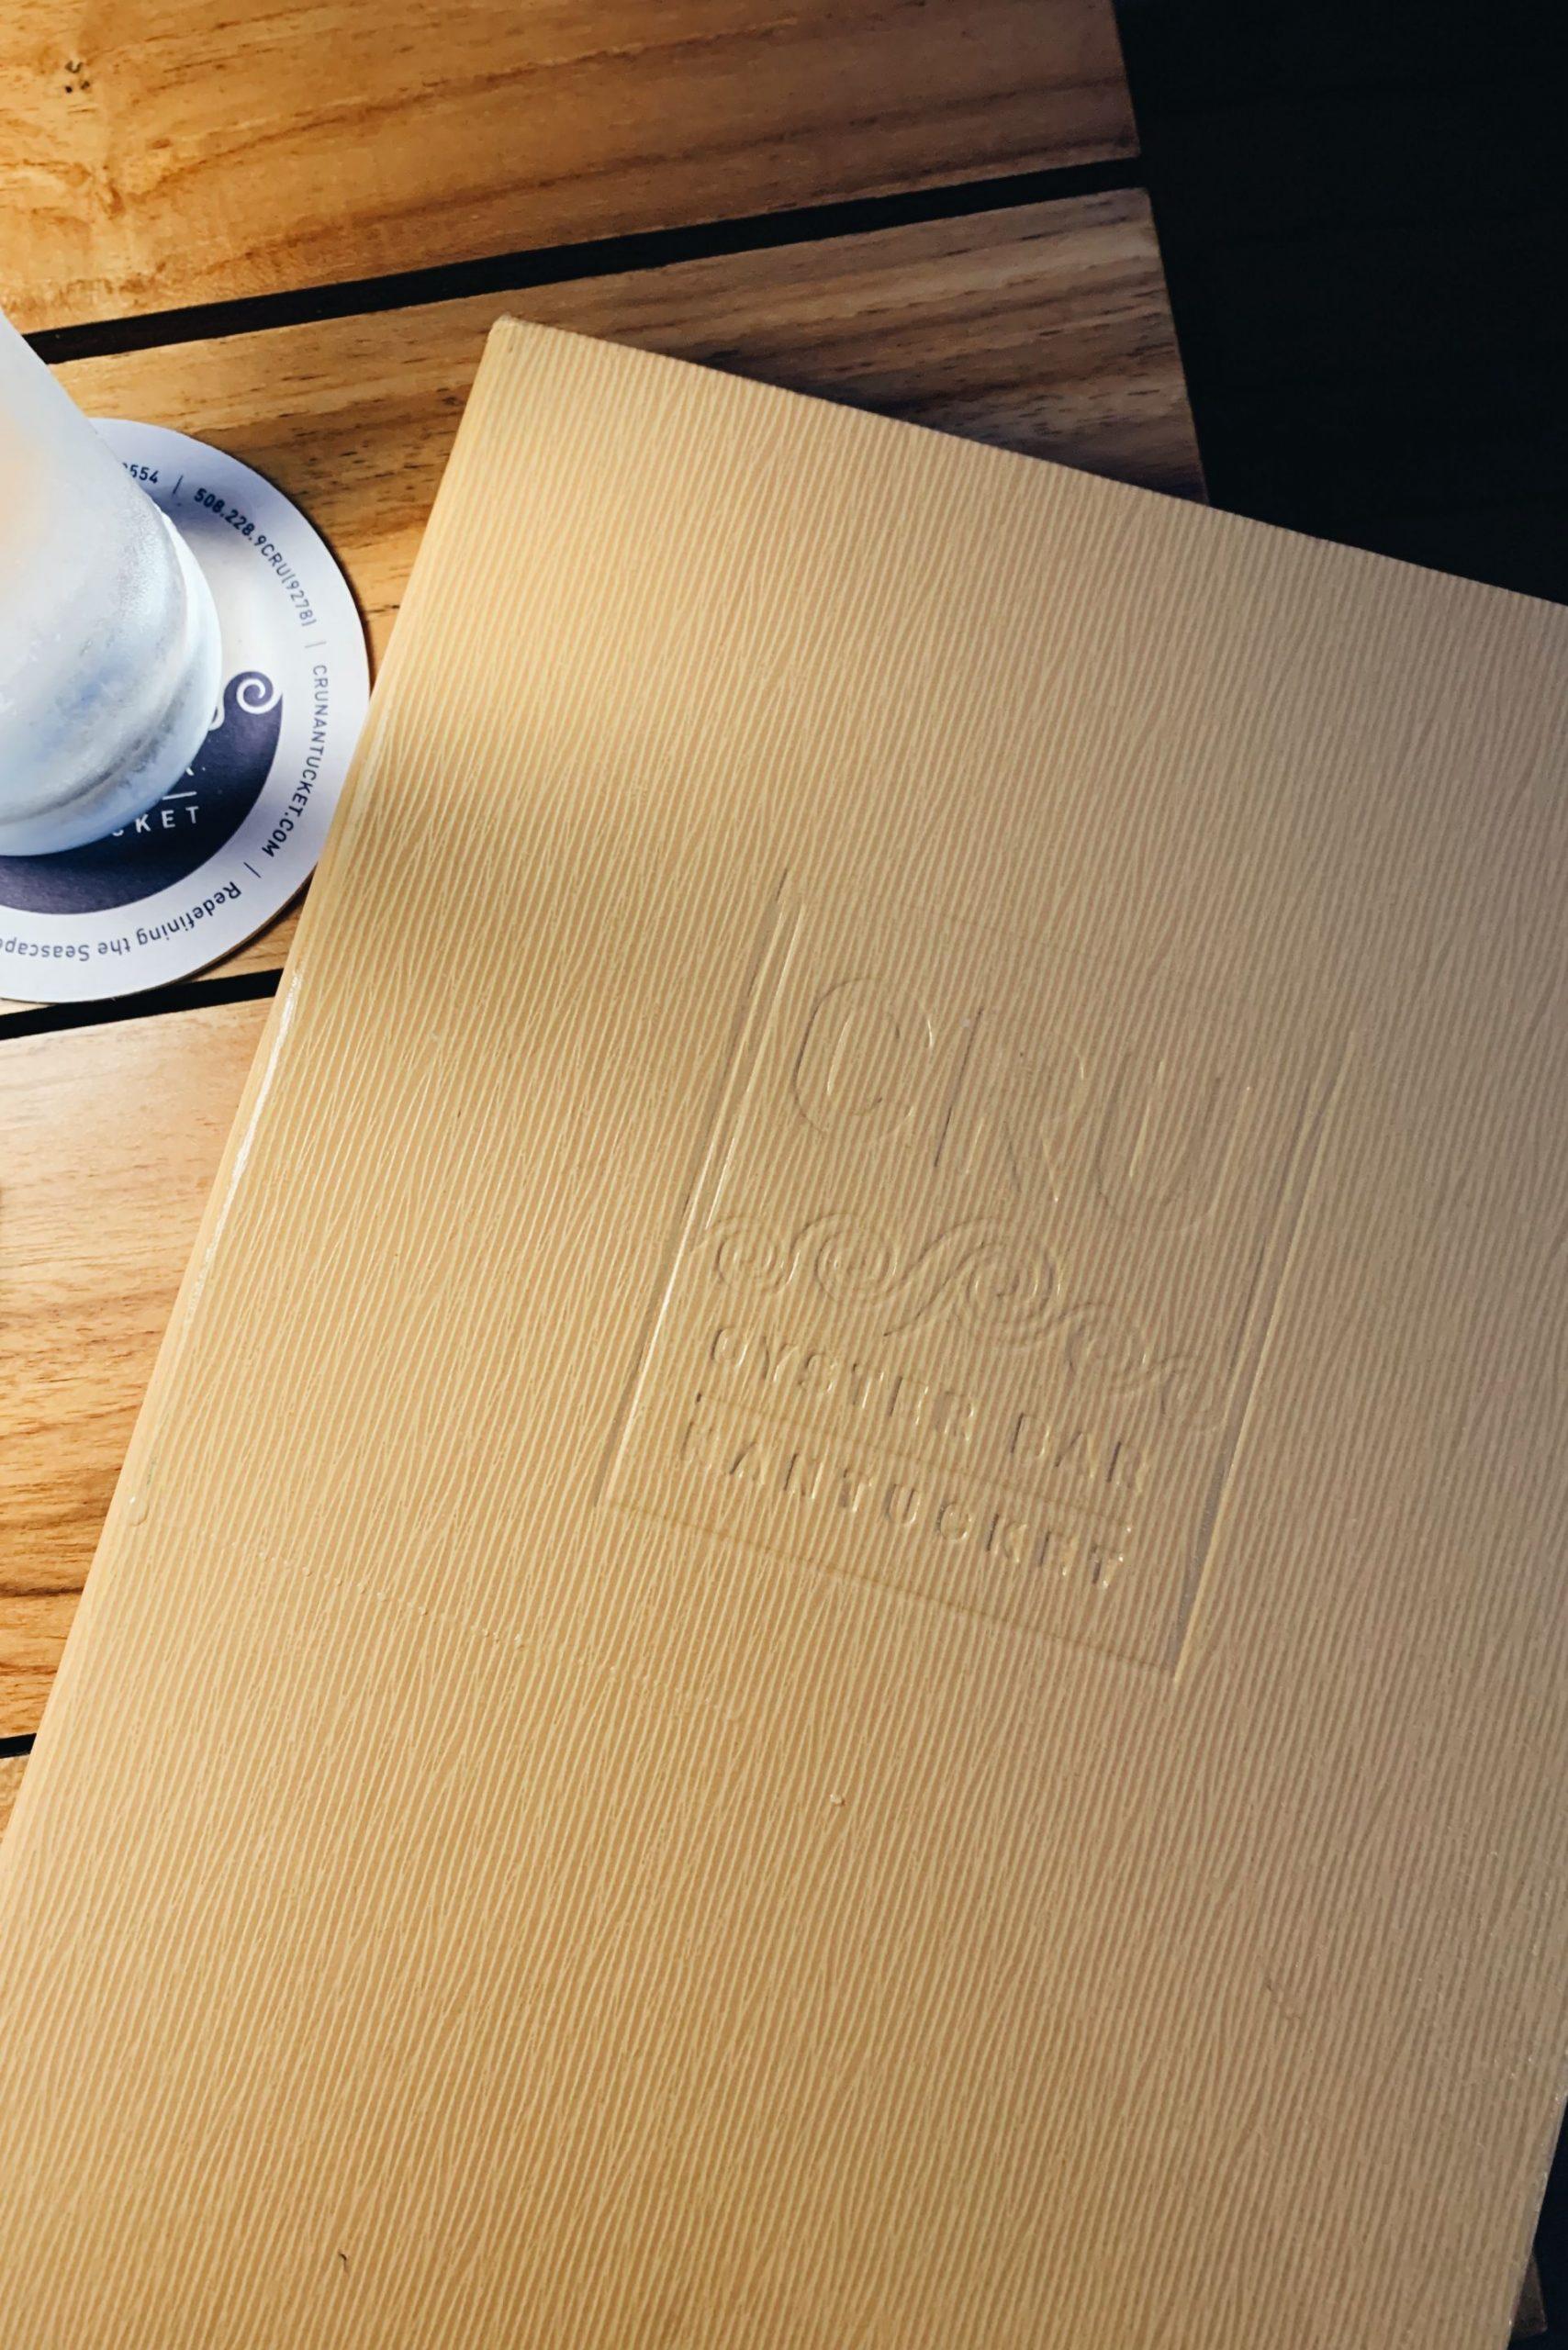 Cru Nantucket menu